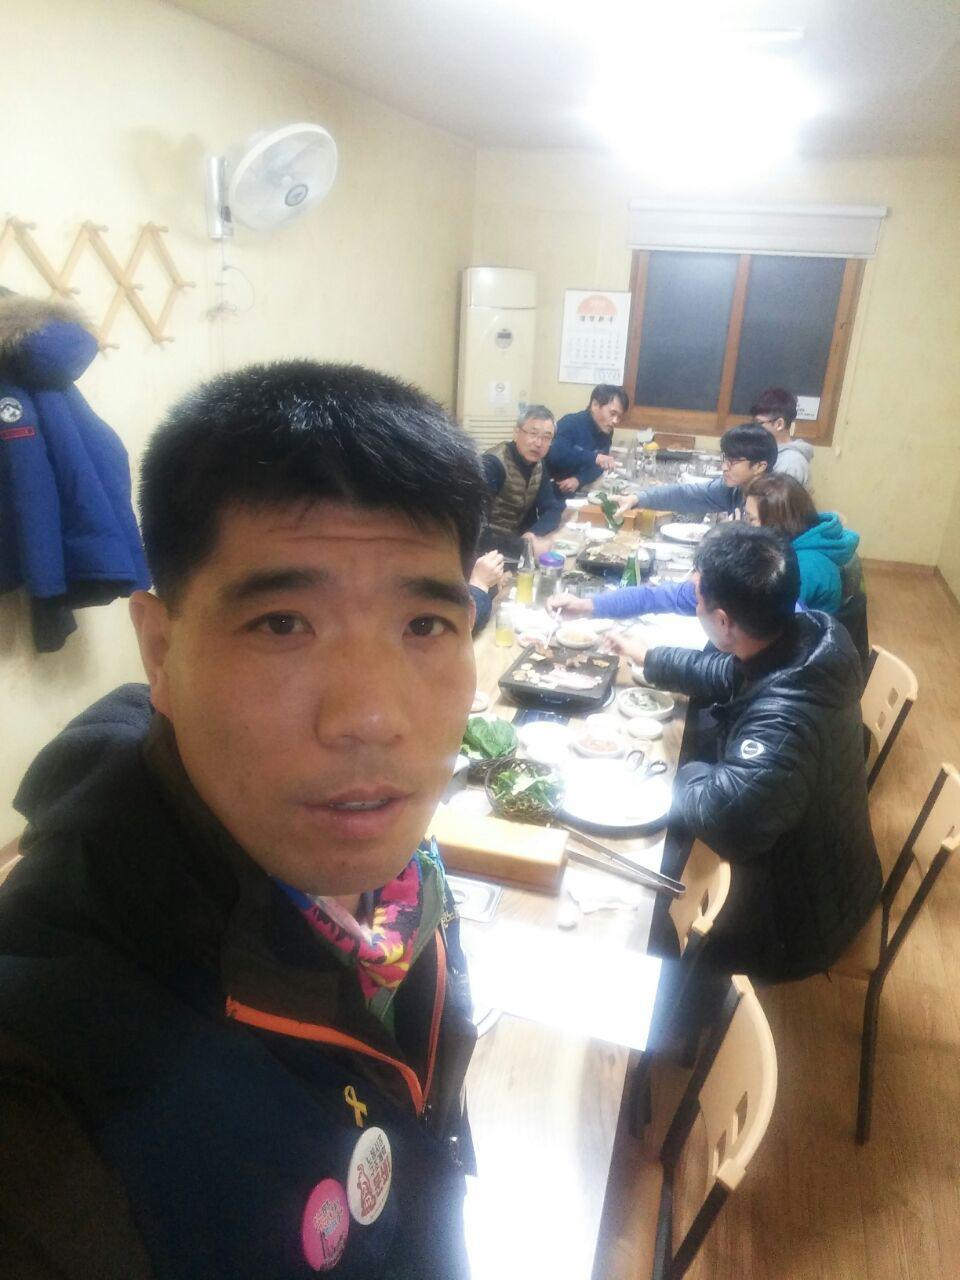 photo_2017-12-29_09-23-04.jpg